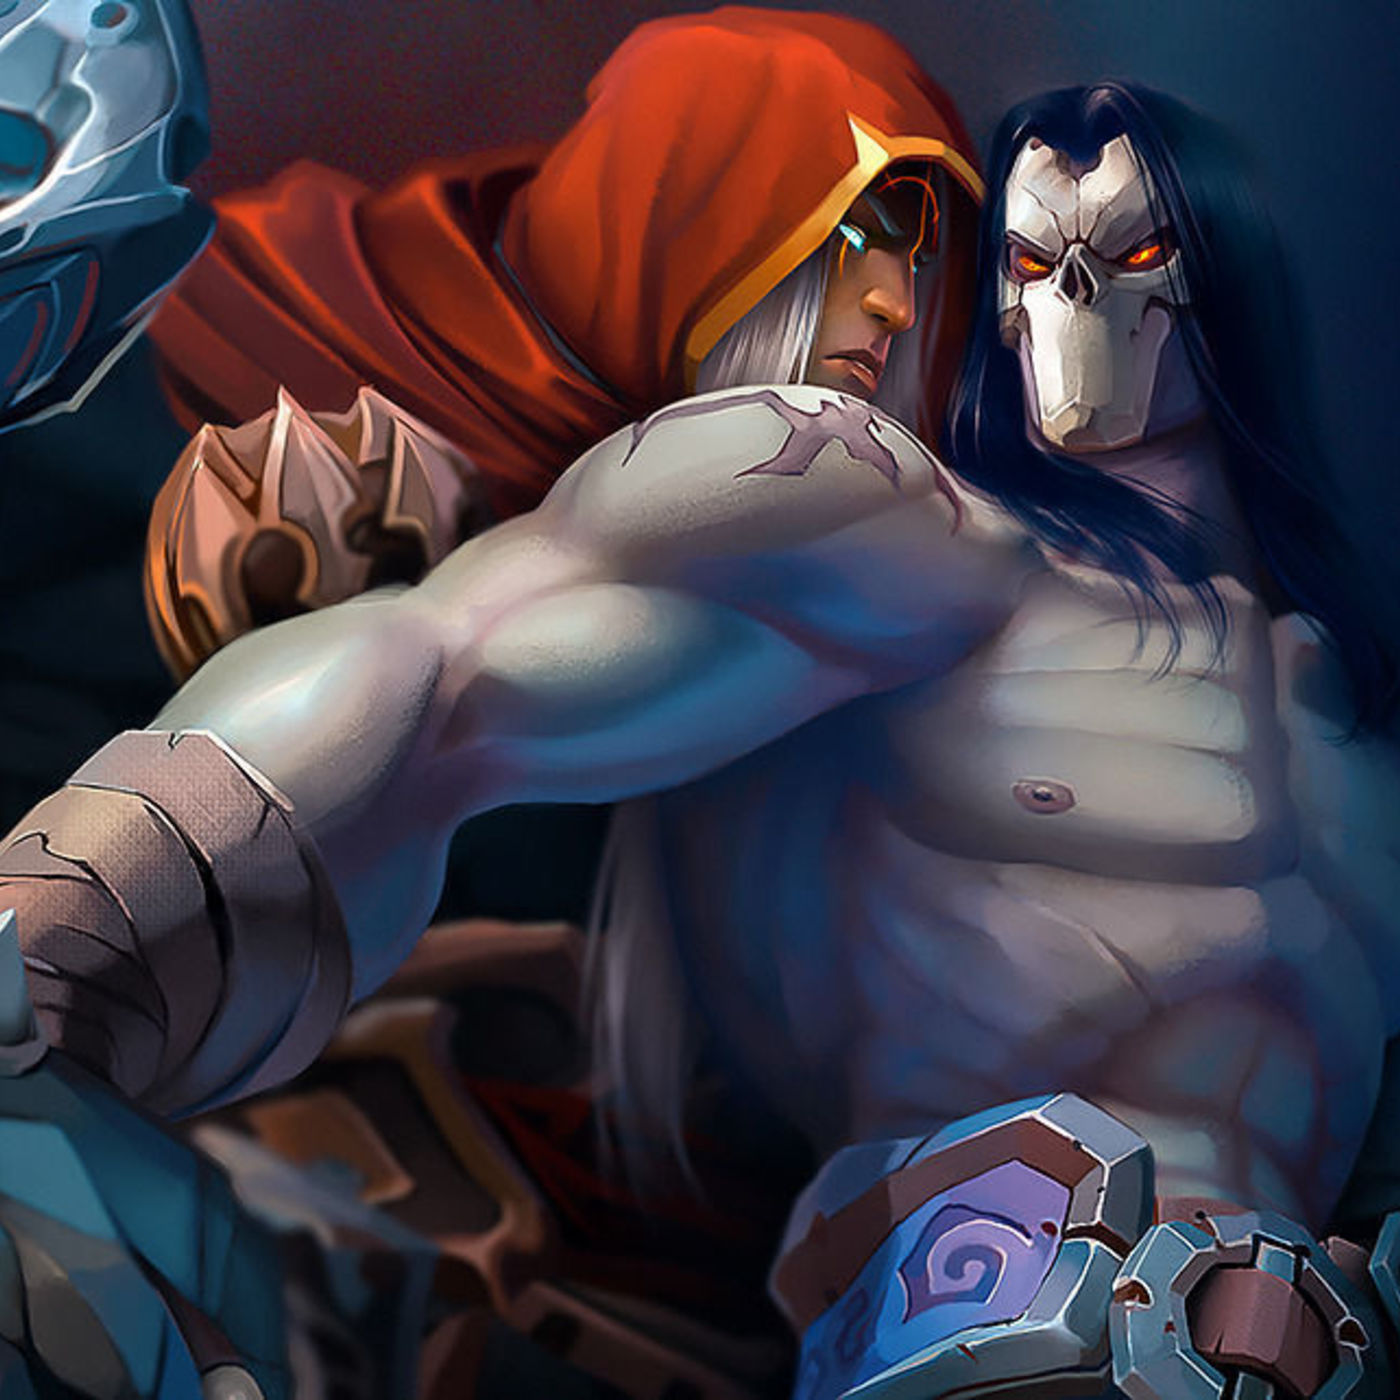 darksiders: War and Death | CGTrader